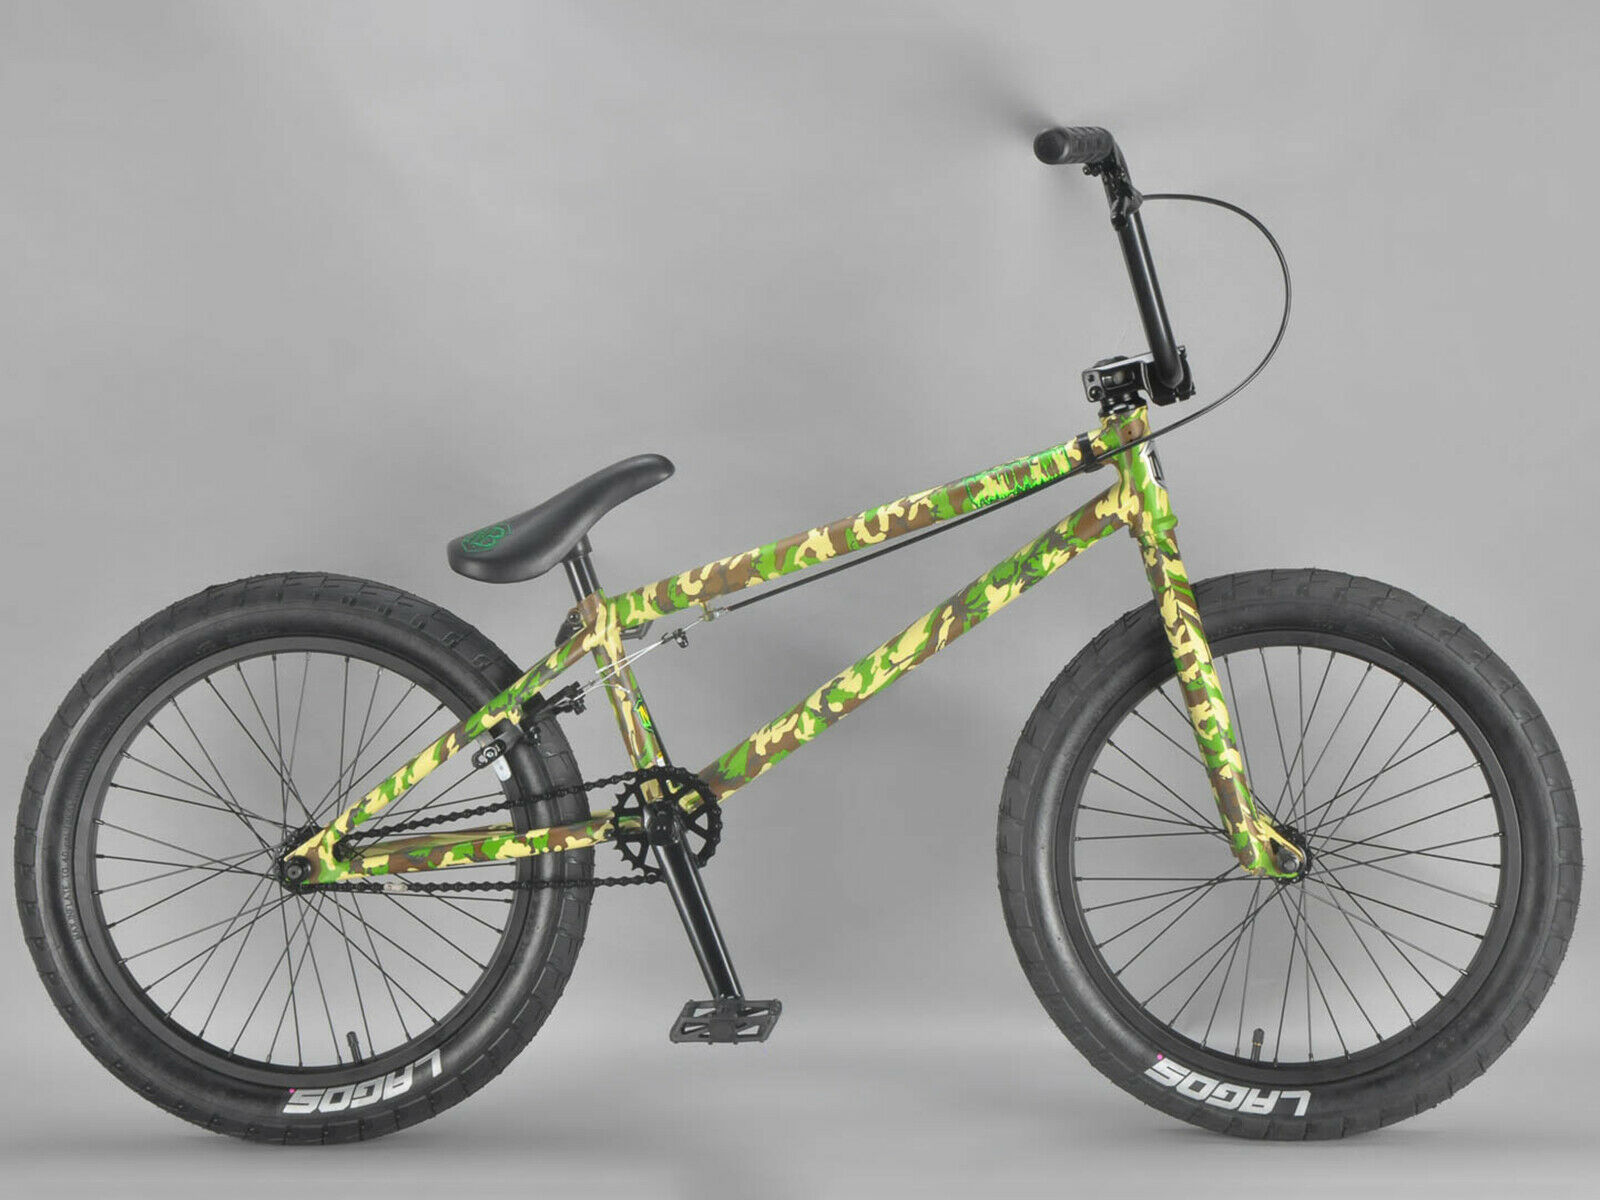 Mafiabikes Harry Main Madmain 20 inch bmx bike available in